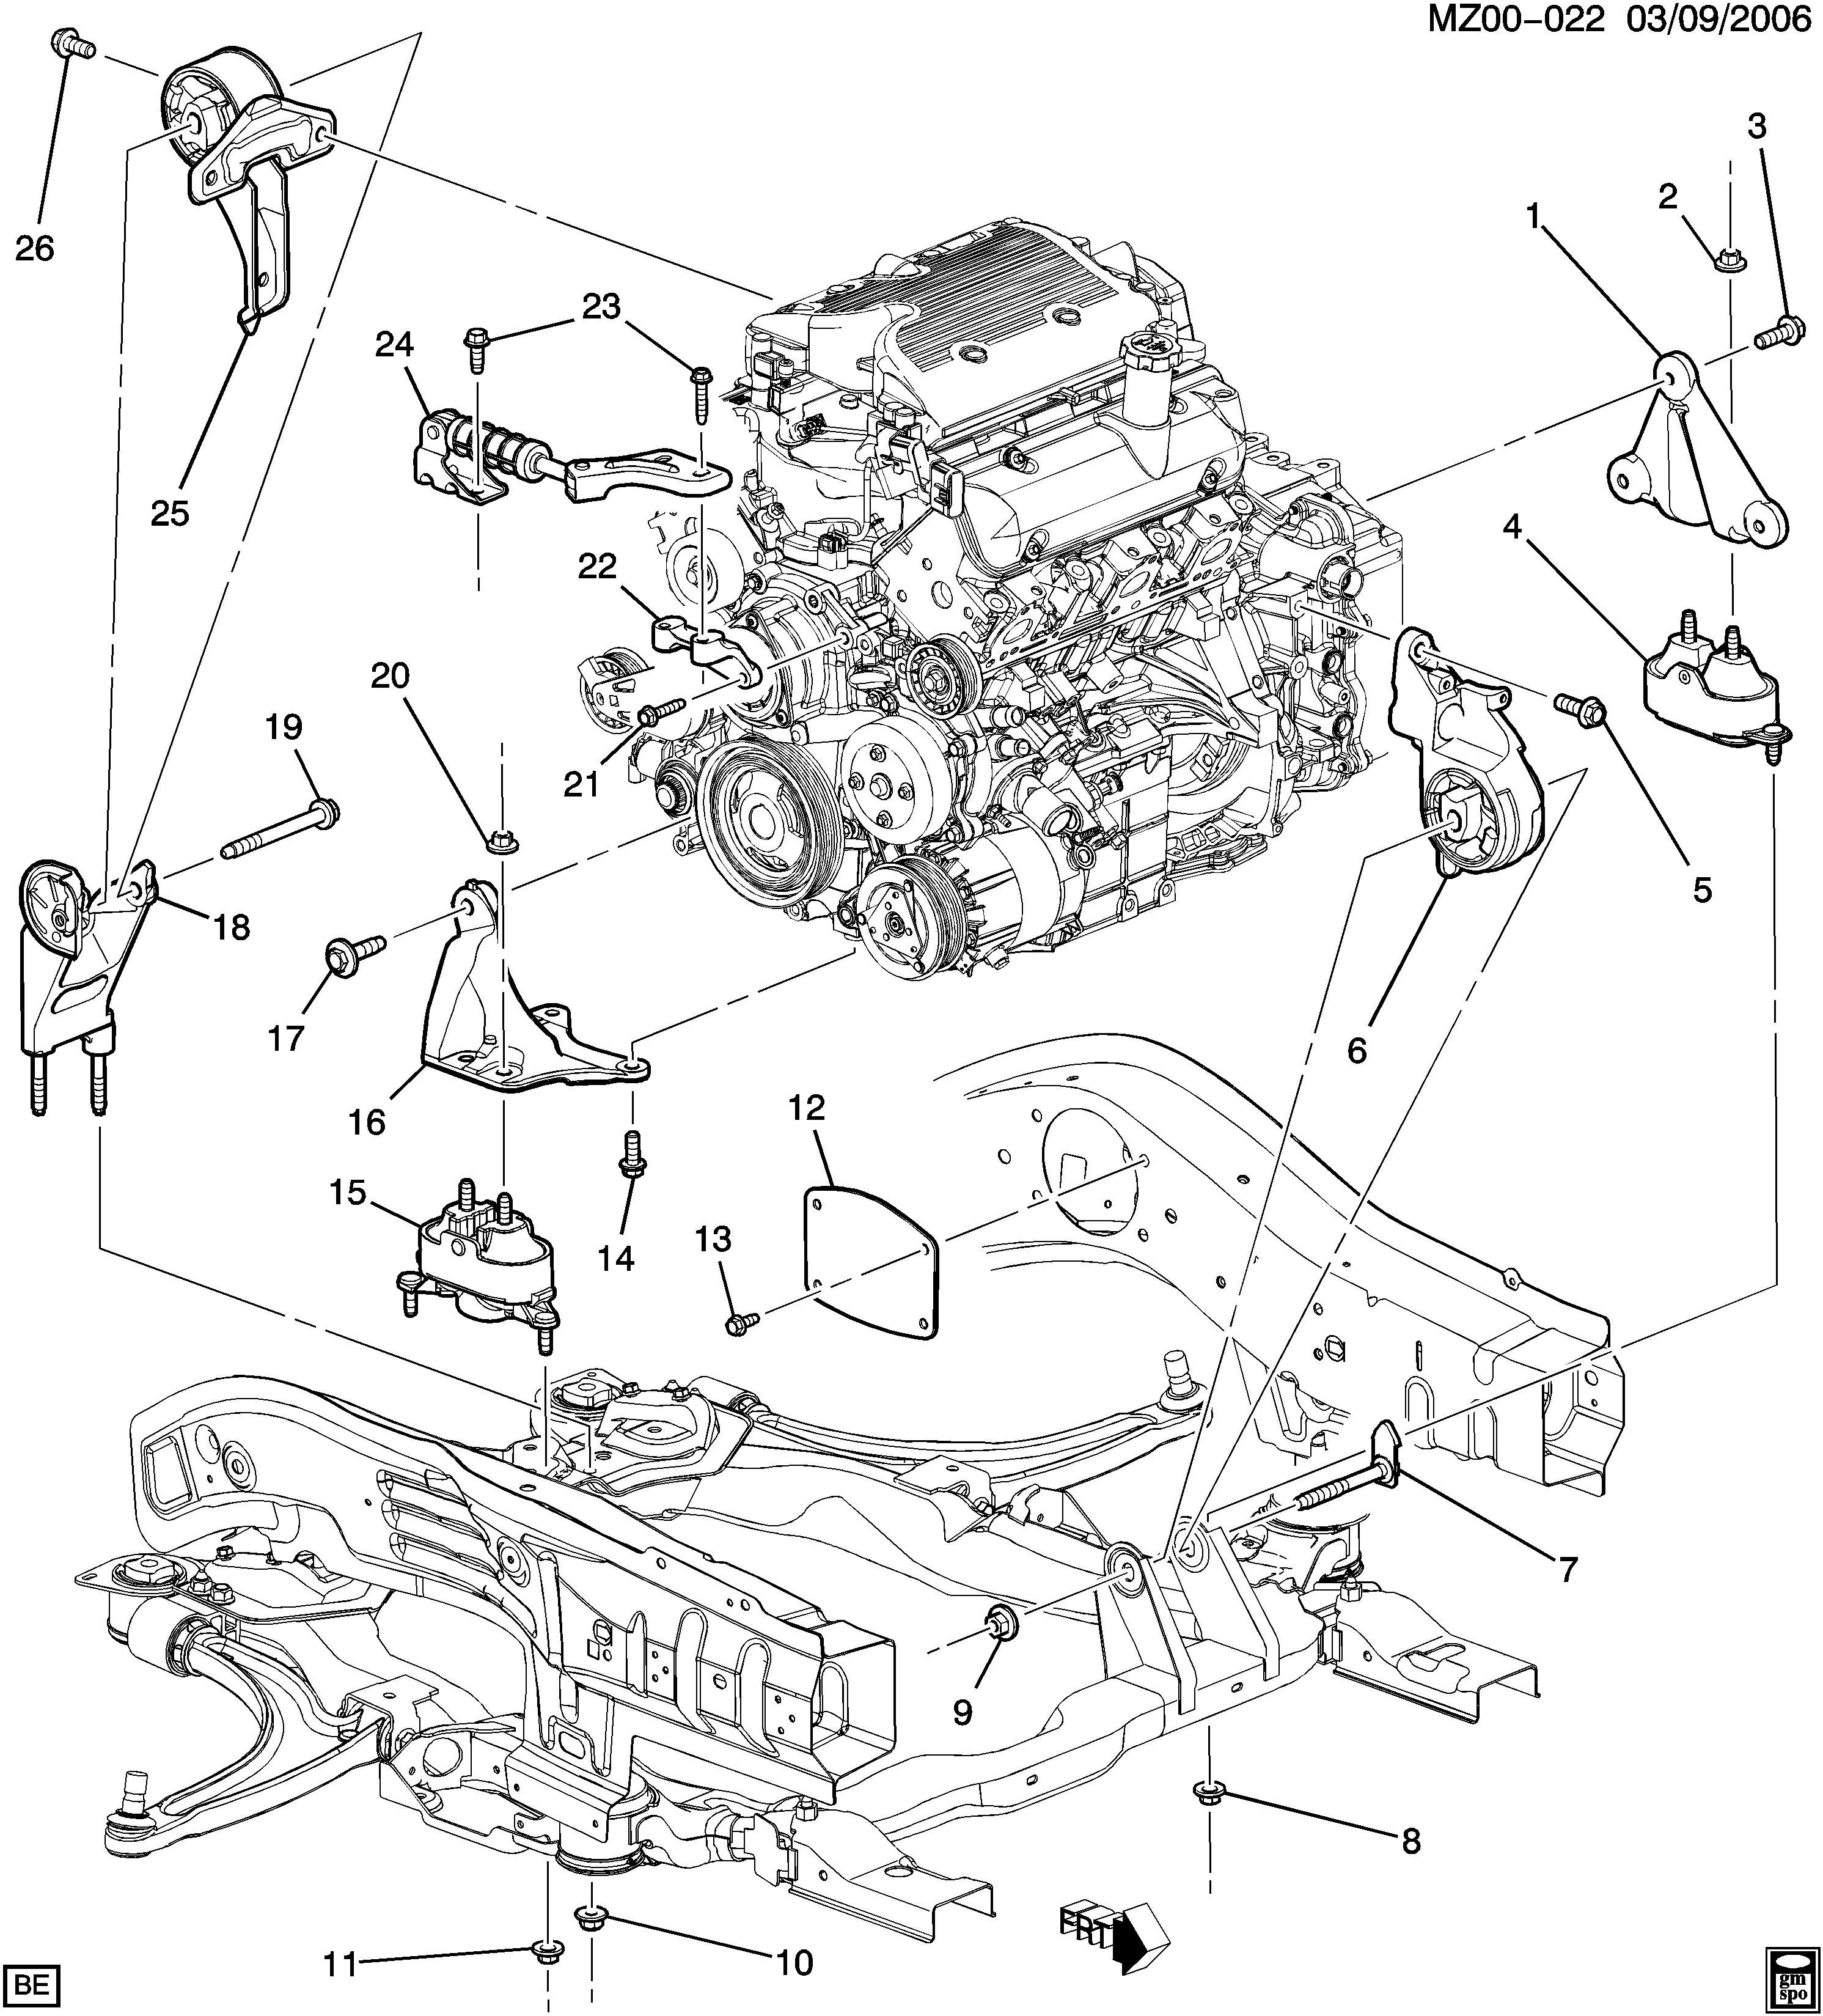 pontiac g6 3 5 engine diagram - wiring diagram base theory-skip-a -  theory-skip-a.jabstudio.it  jab studio